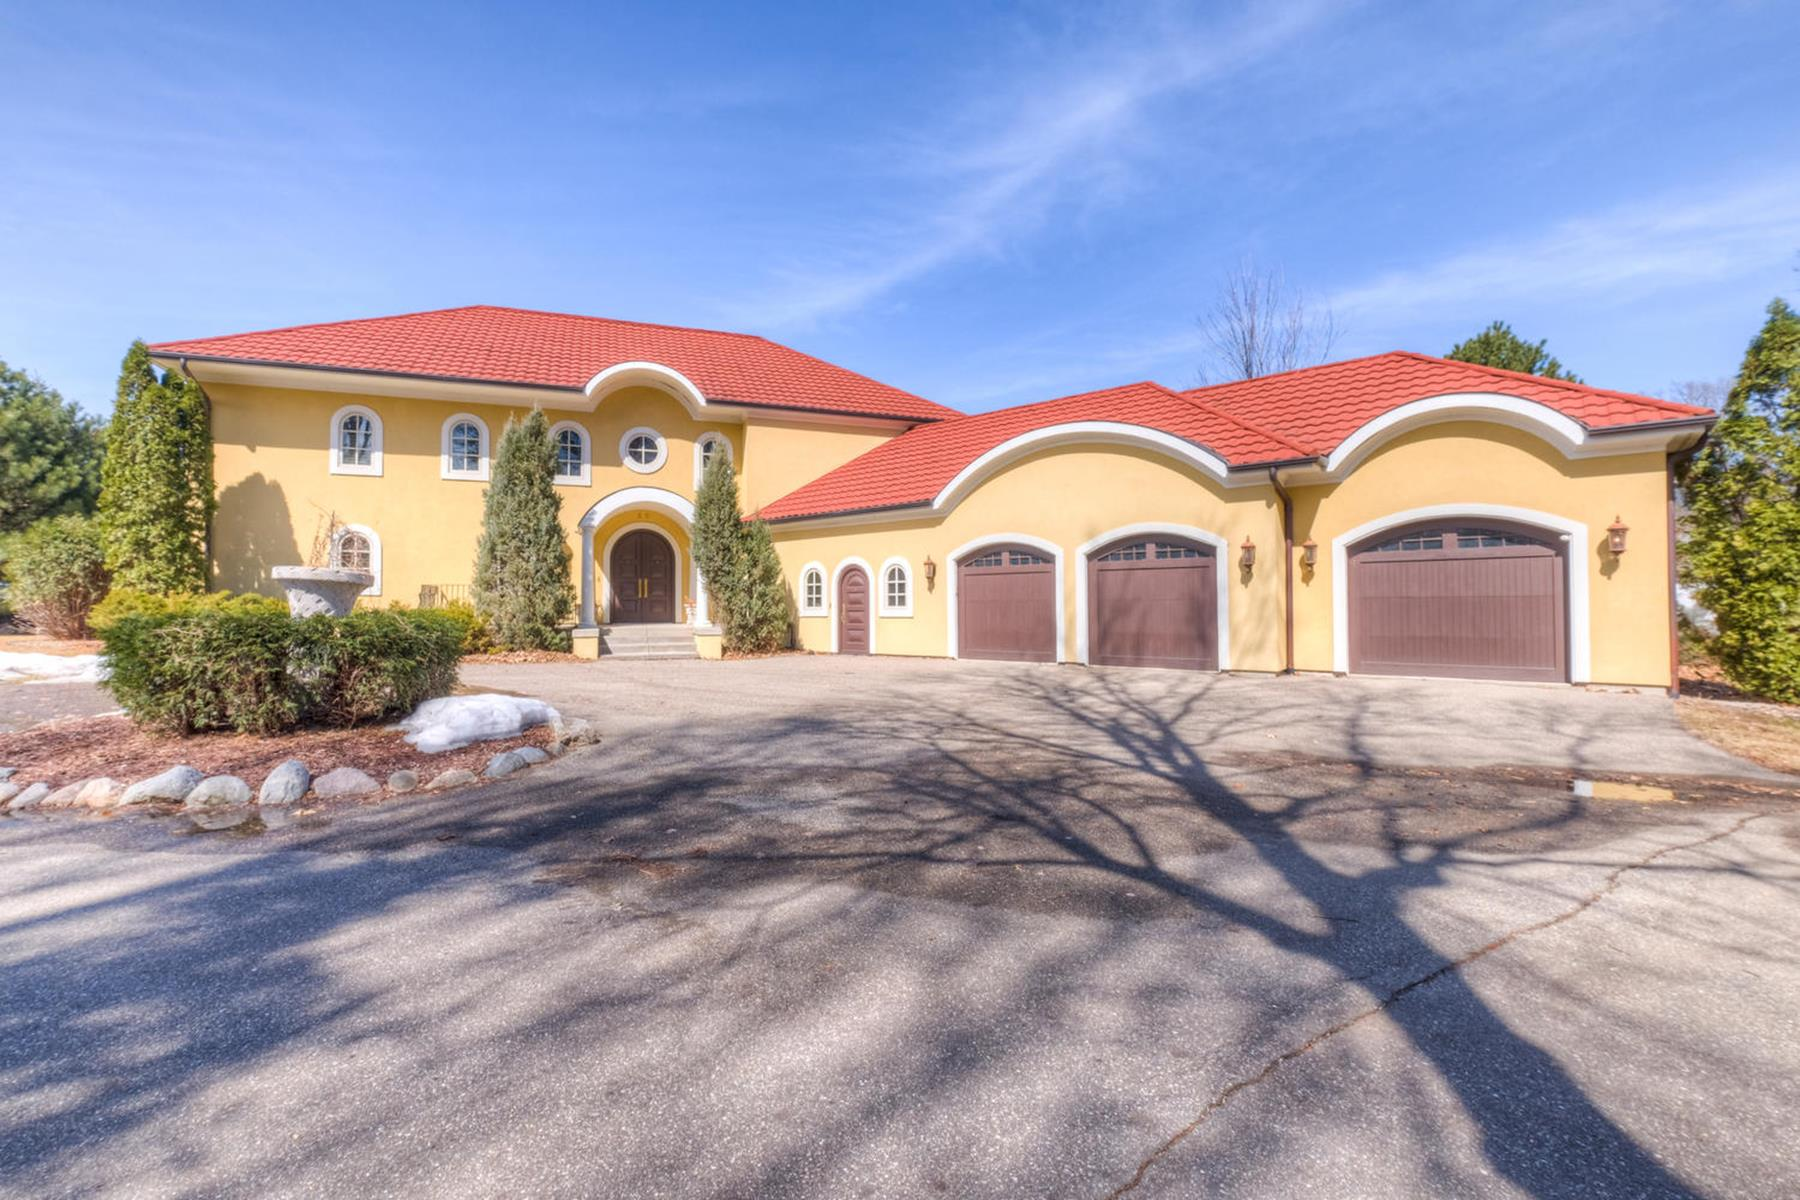 Single Family Homes للـ Sale في Beautiful Tuscan Style Home on Prime Sandy West-facing Lakeshore 30 Old Orchard Lane, Tonka Bay, Minnesota 55331 United States